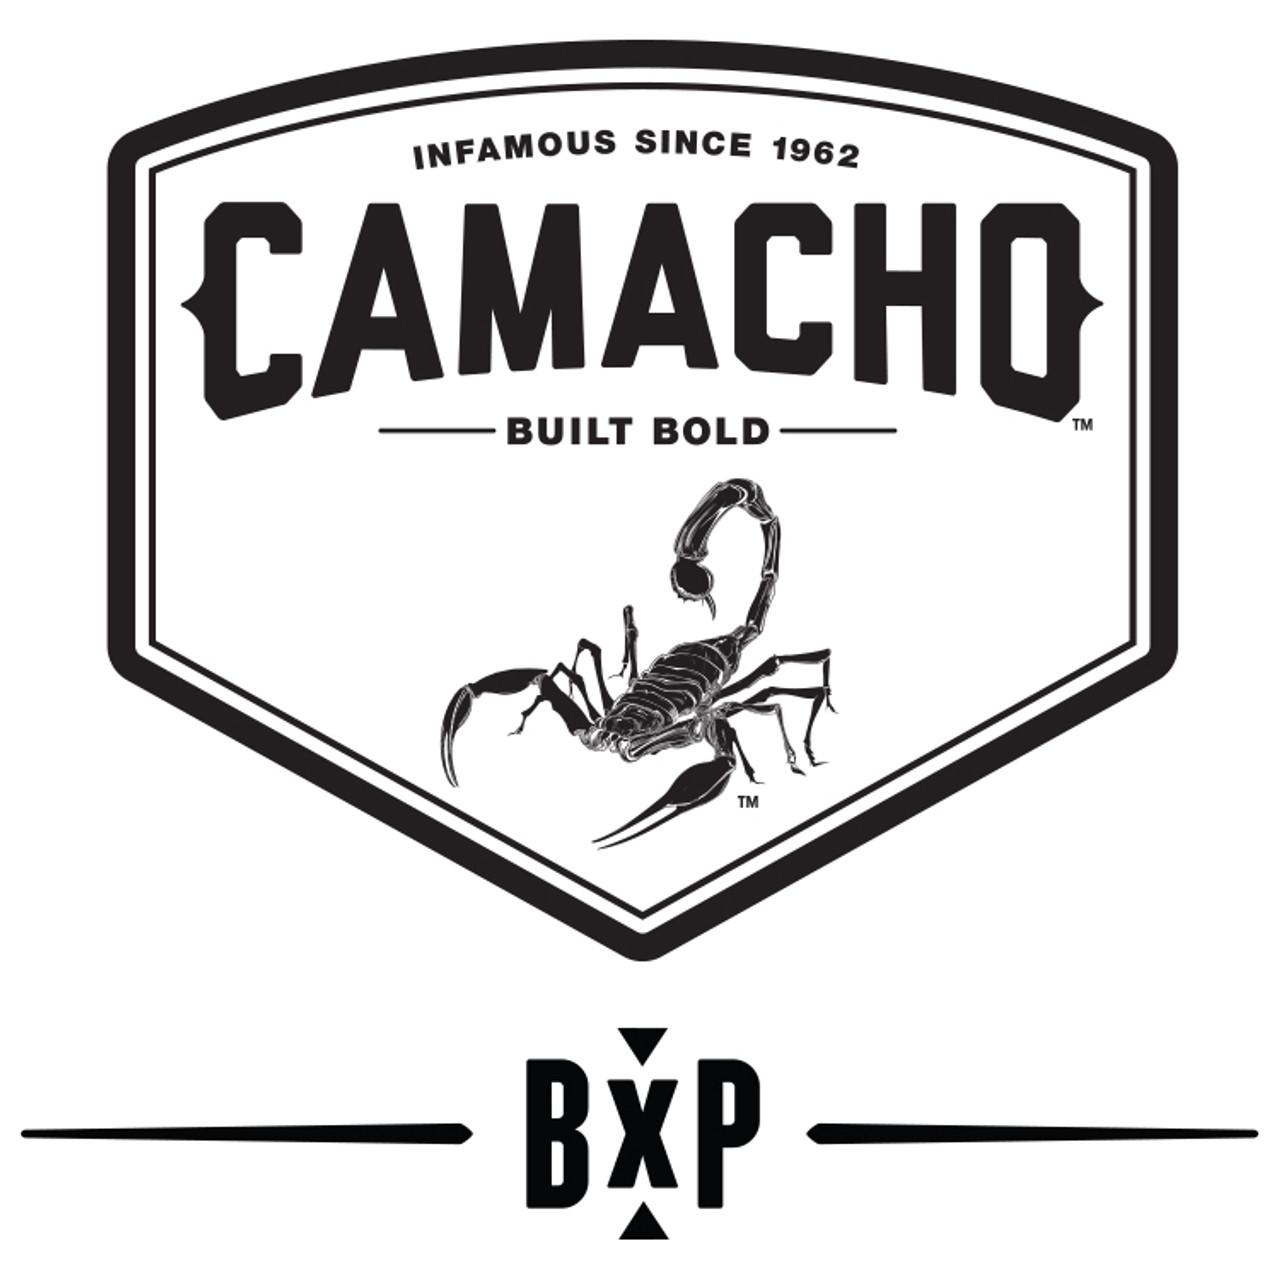 Camacho BXP Connecticut Robusto Cigars - 5 x 50 (Box of 20)